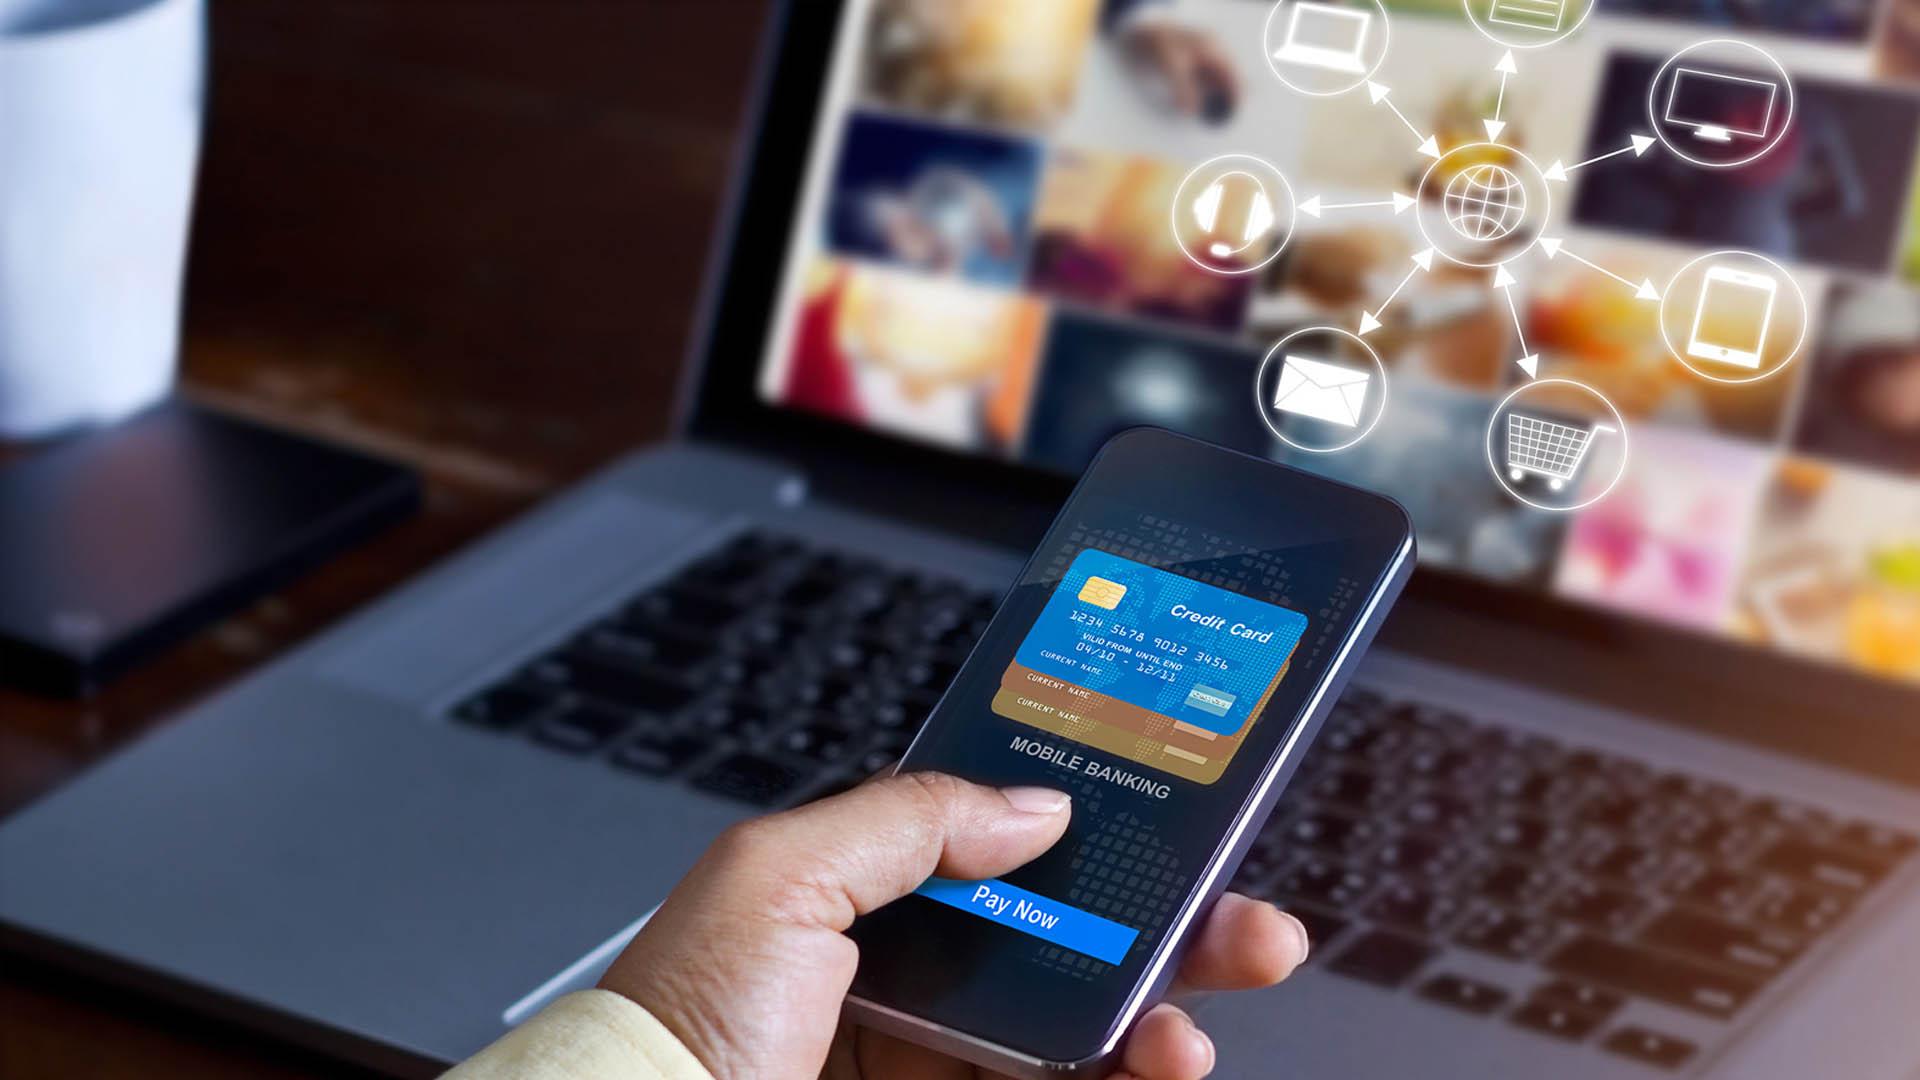 Att Uverse Internet With Lightning Fast Speed Digital Tv Bundles Manage U Verse Dvr Online